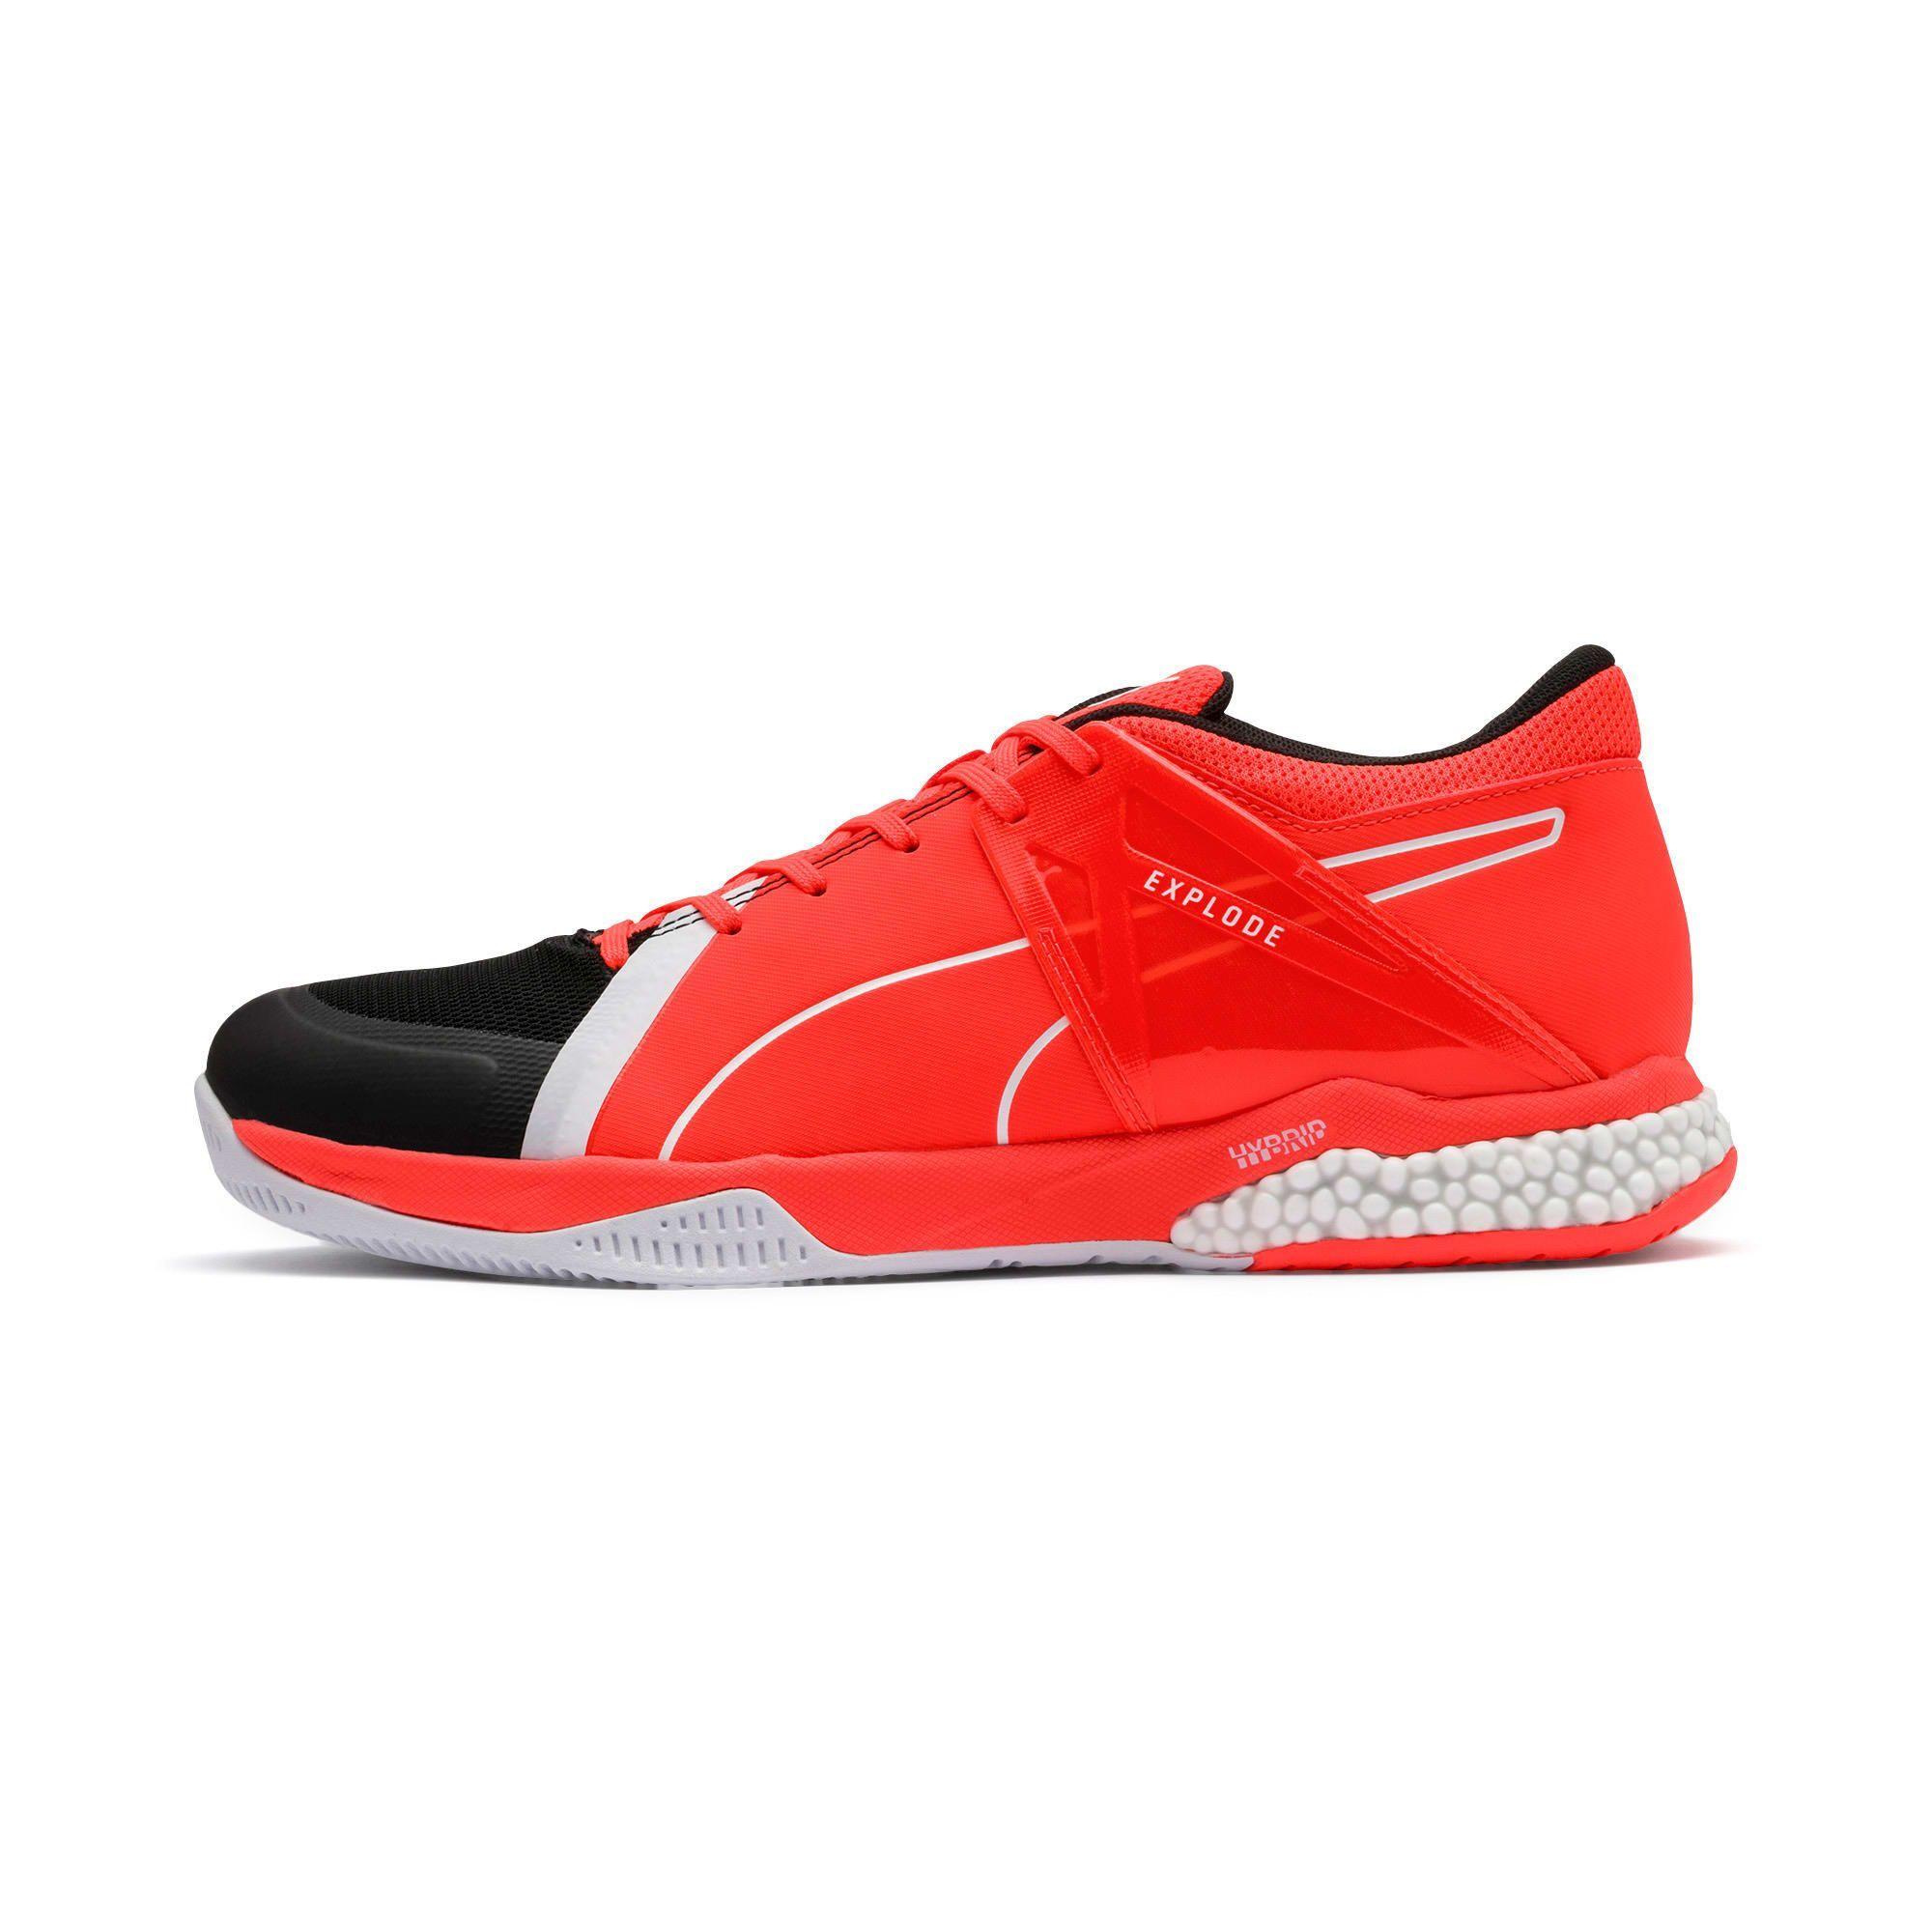 PUMA Explode XT Hybrid 2 Handball Shoes